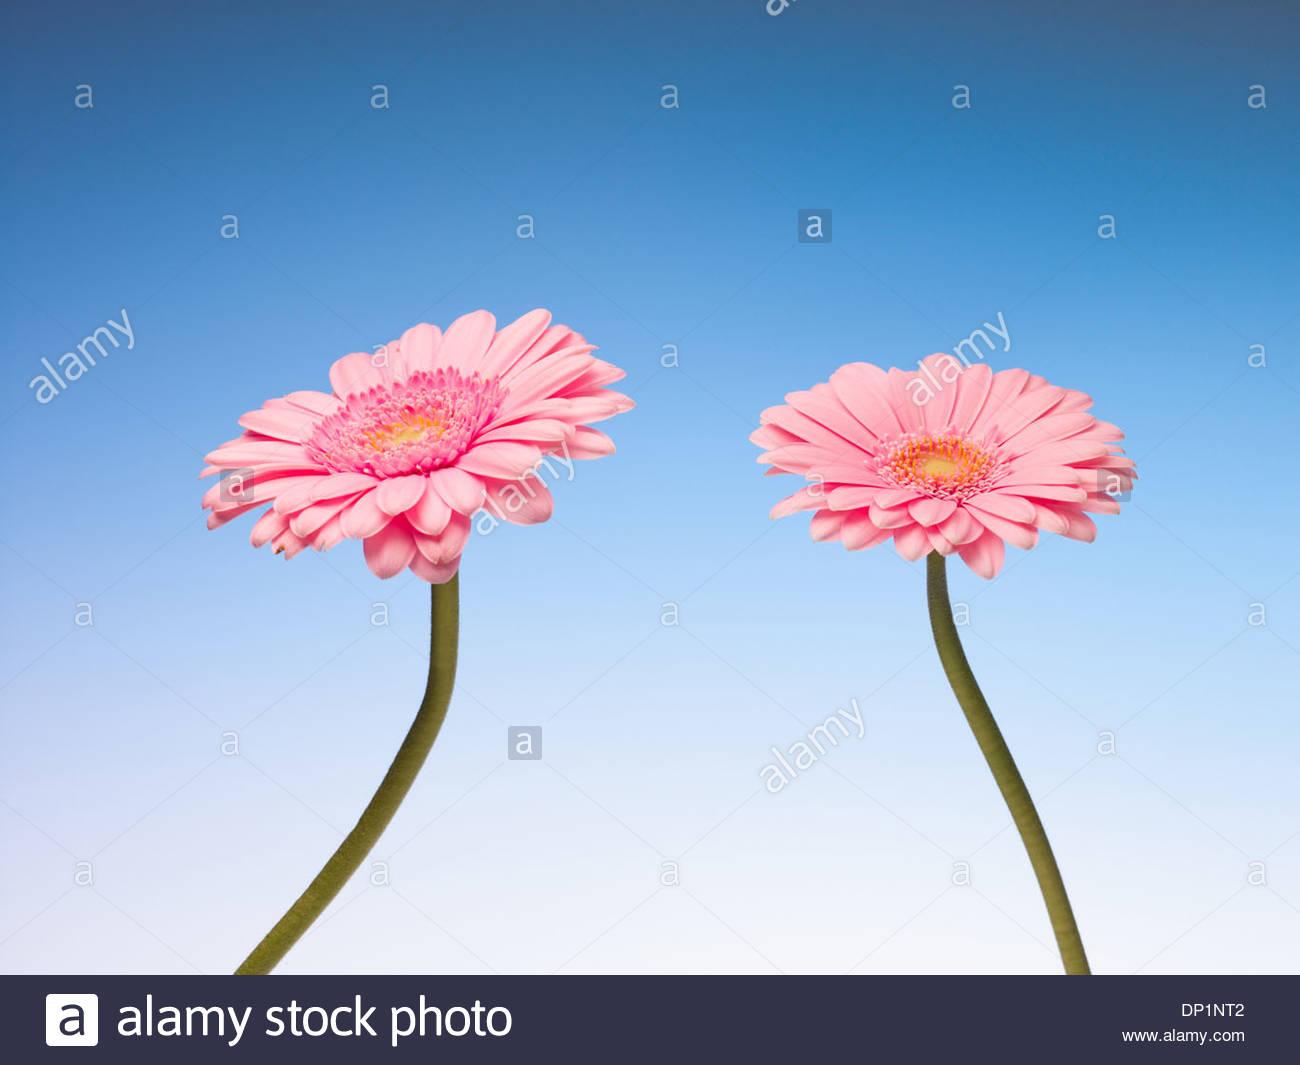 Zwei rosa Gerbera daisies Stockbild